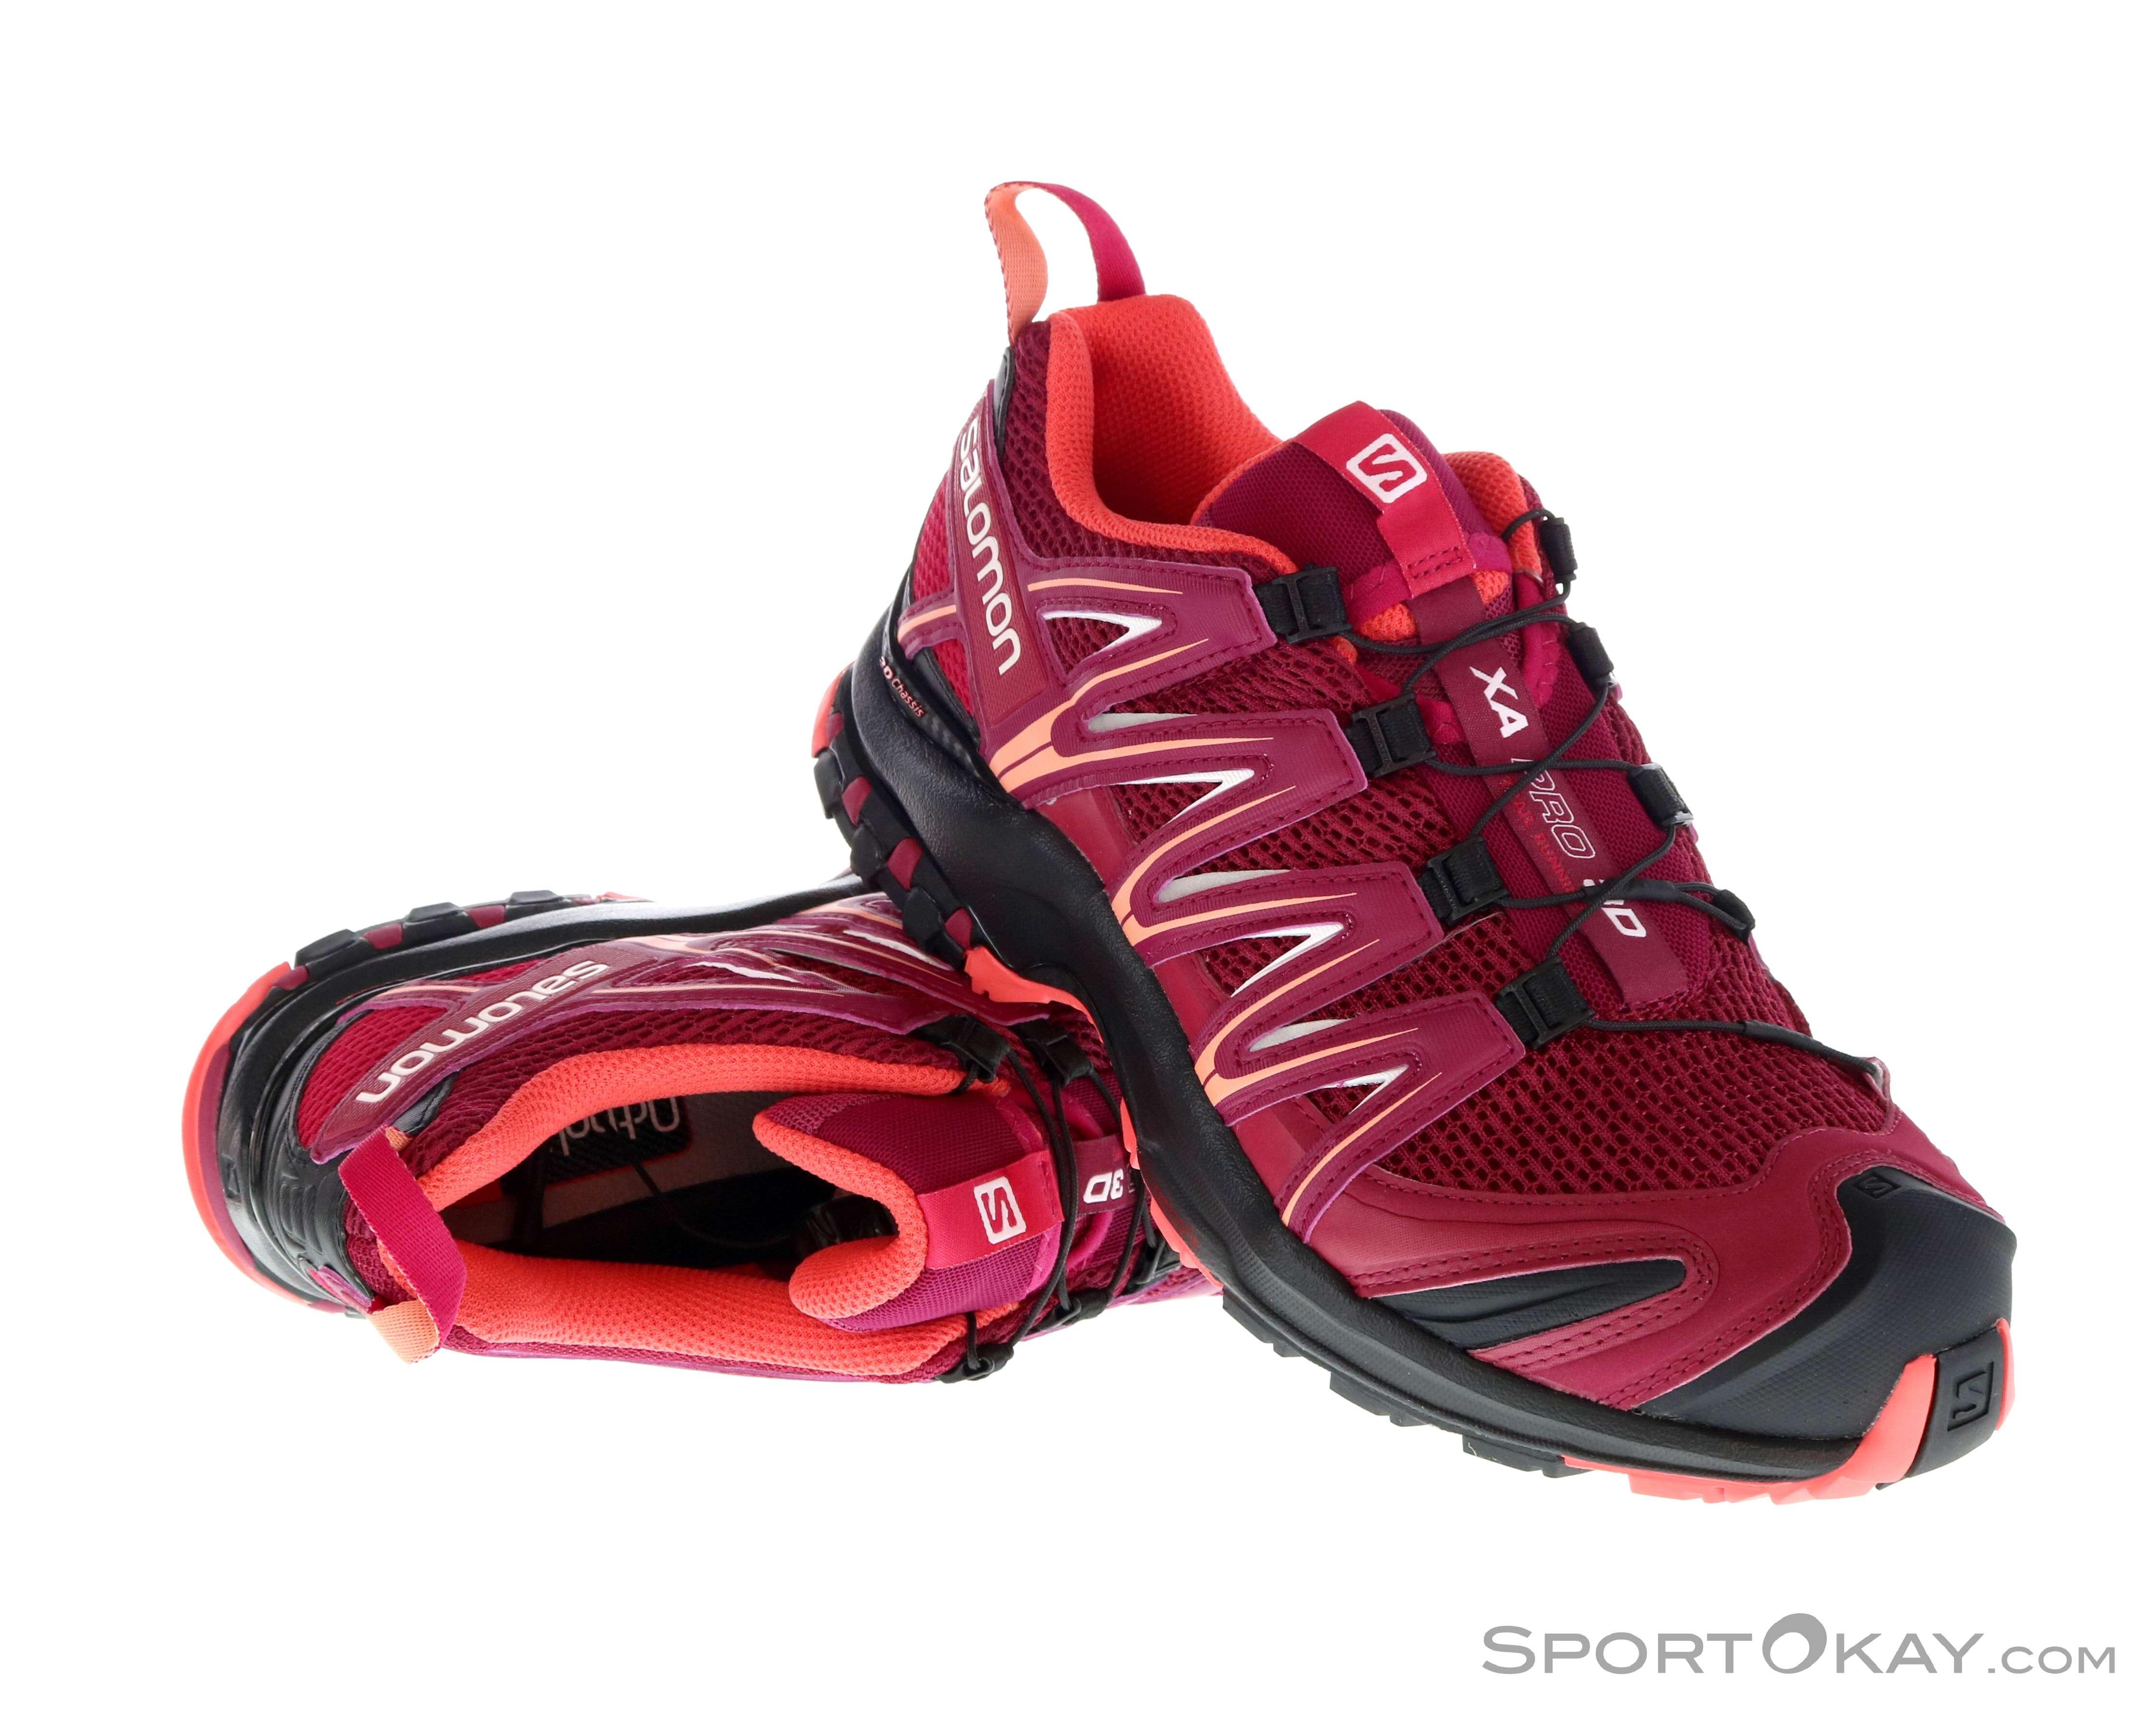 Salomon XA Pro 3D Womens Trail Running Shoes Trail Running